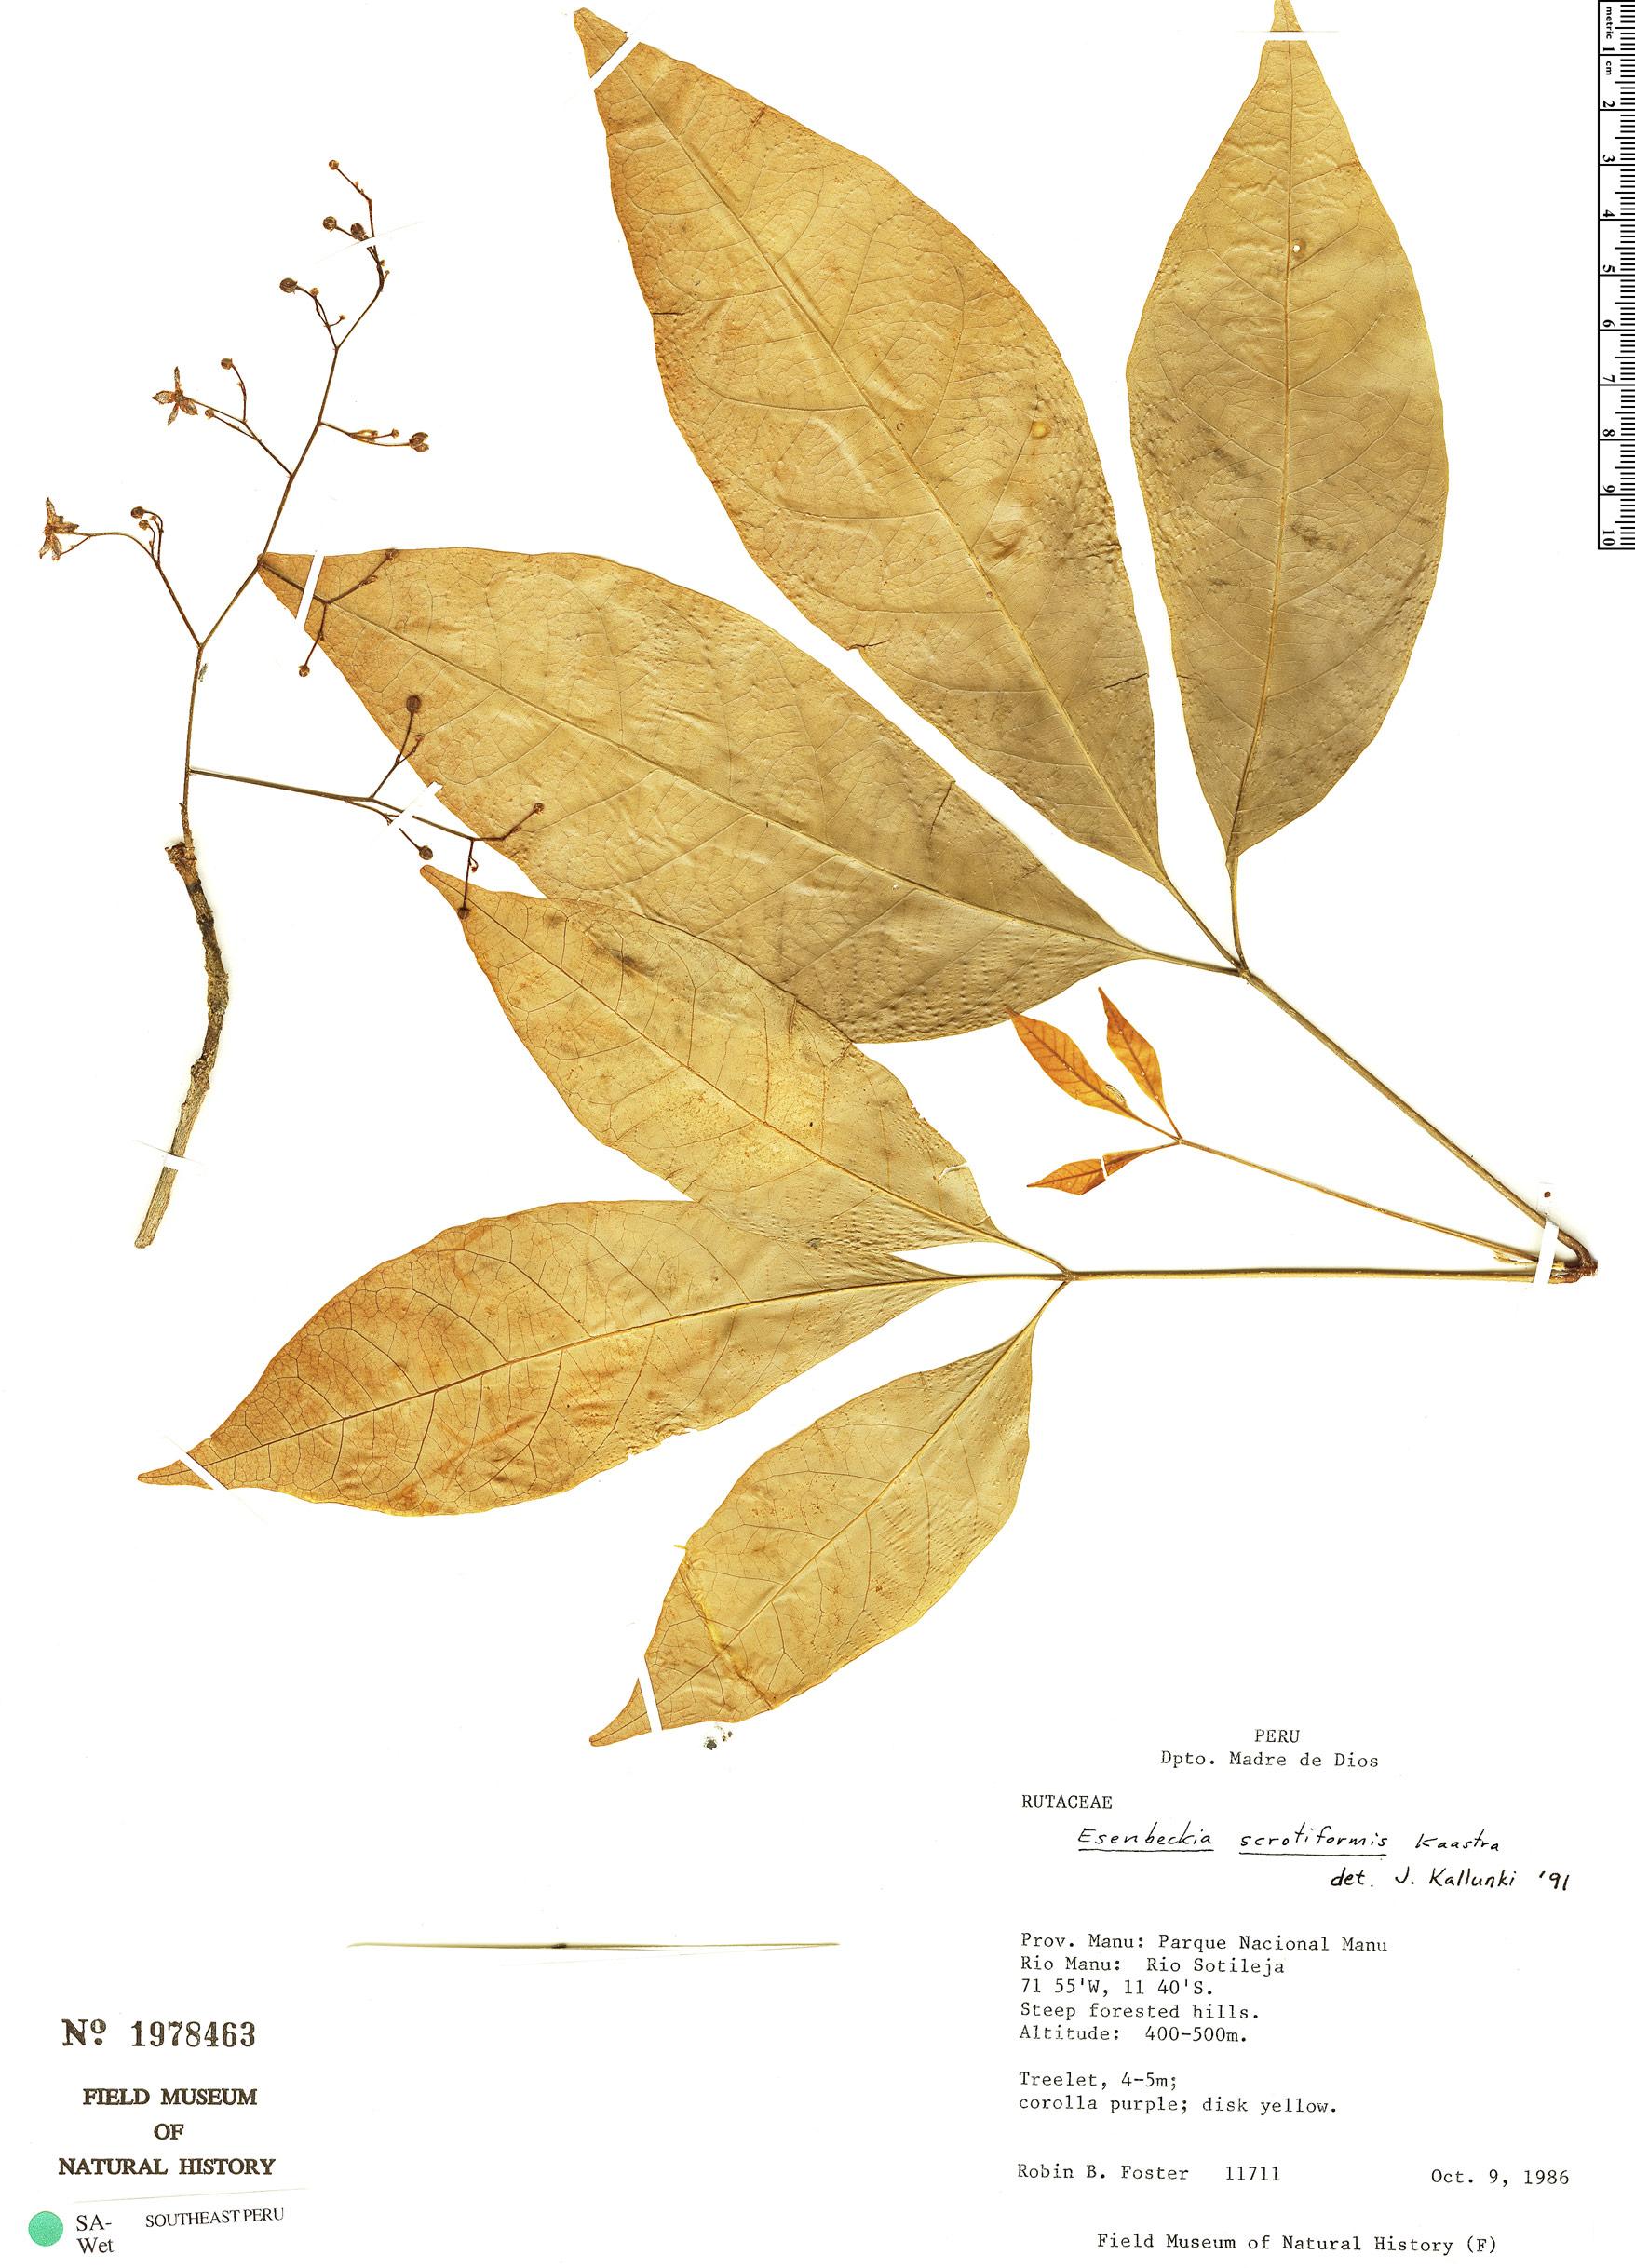 Specimen: Esenbeckia scrotiformis